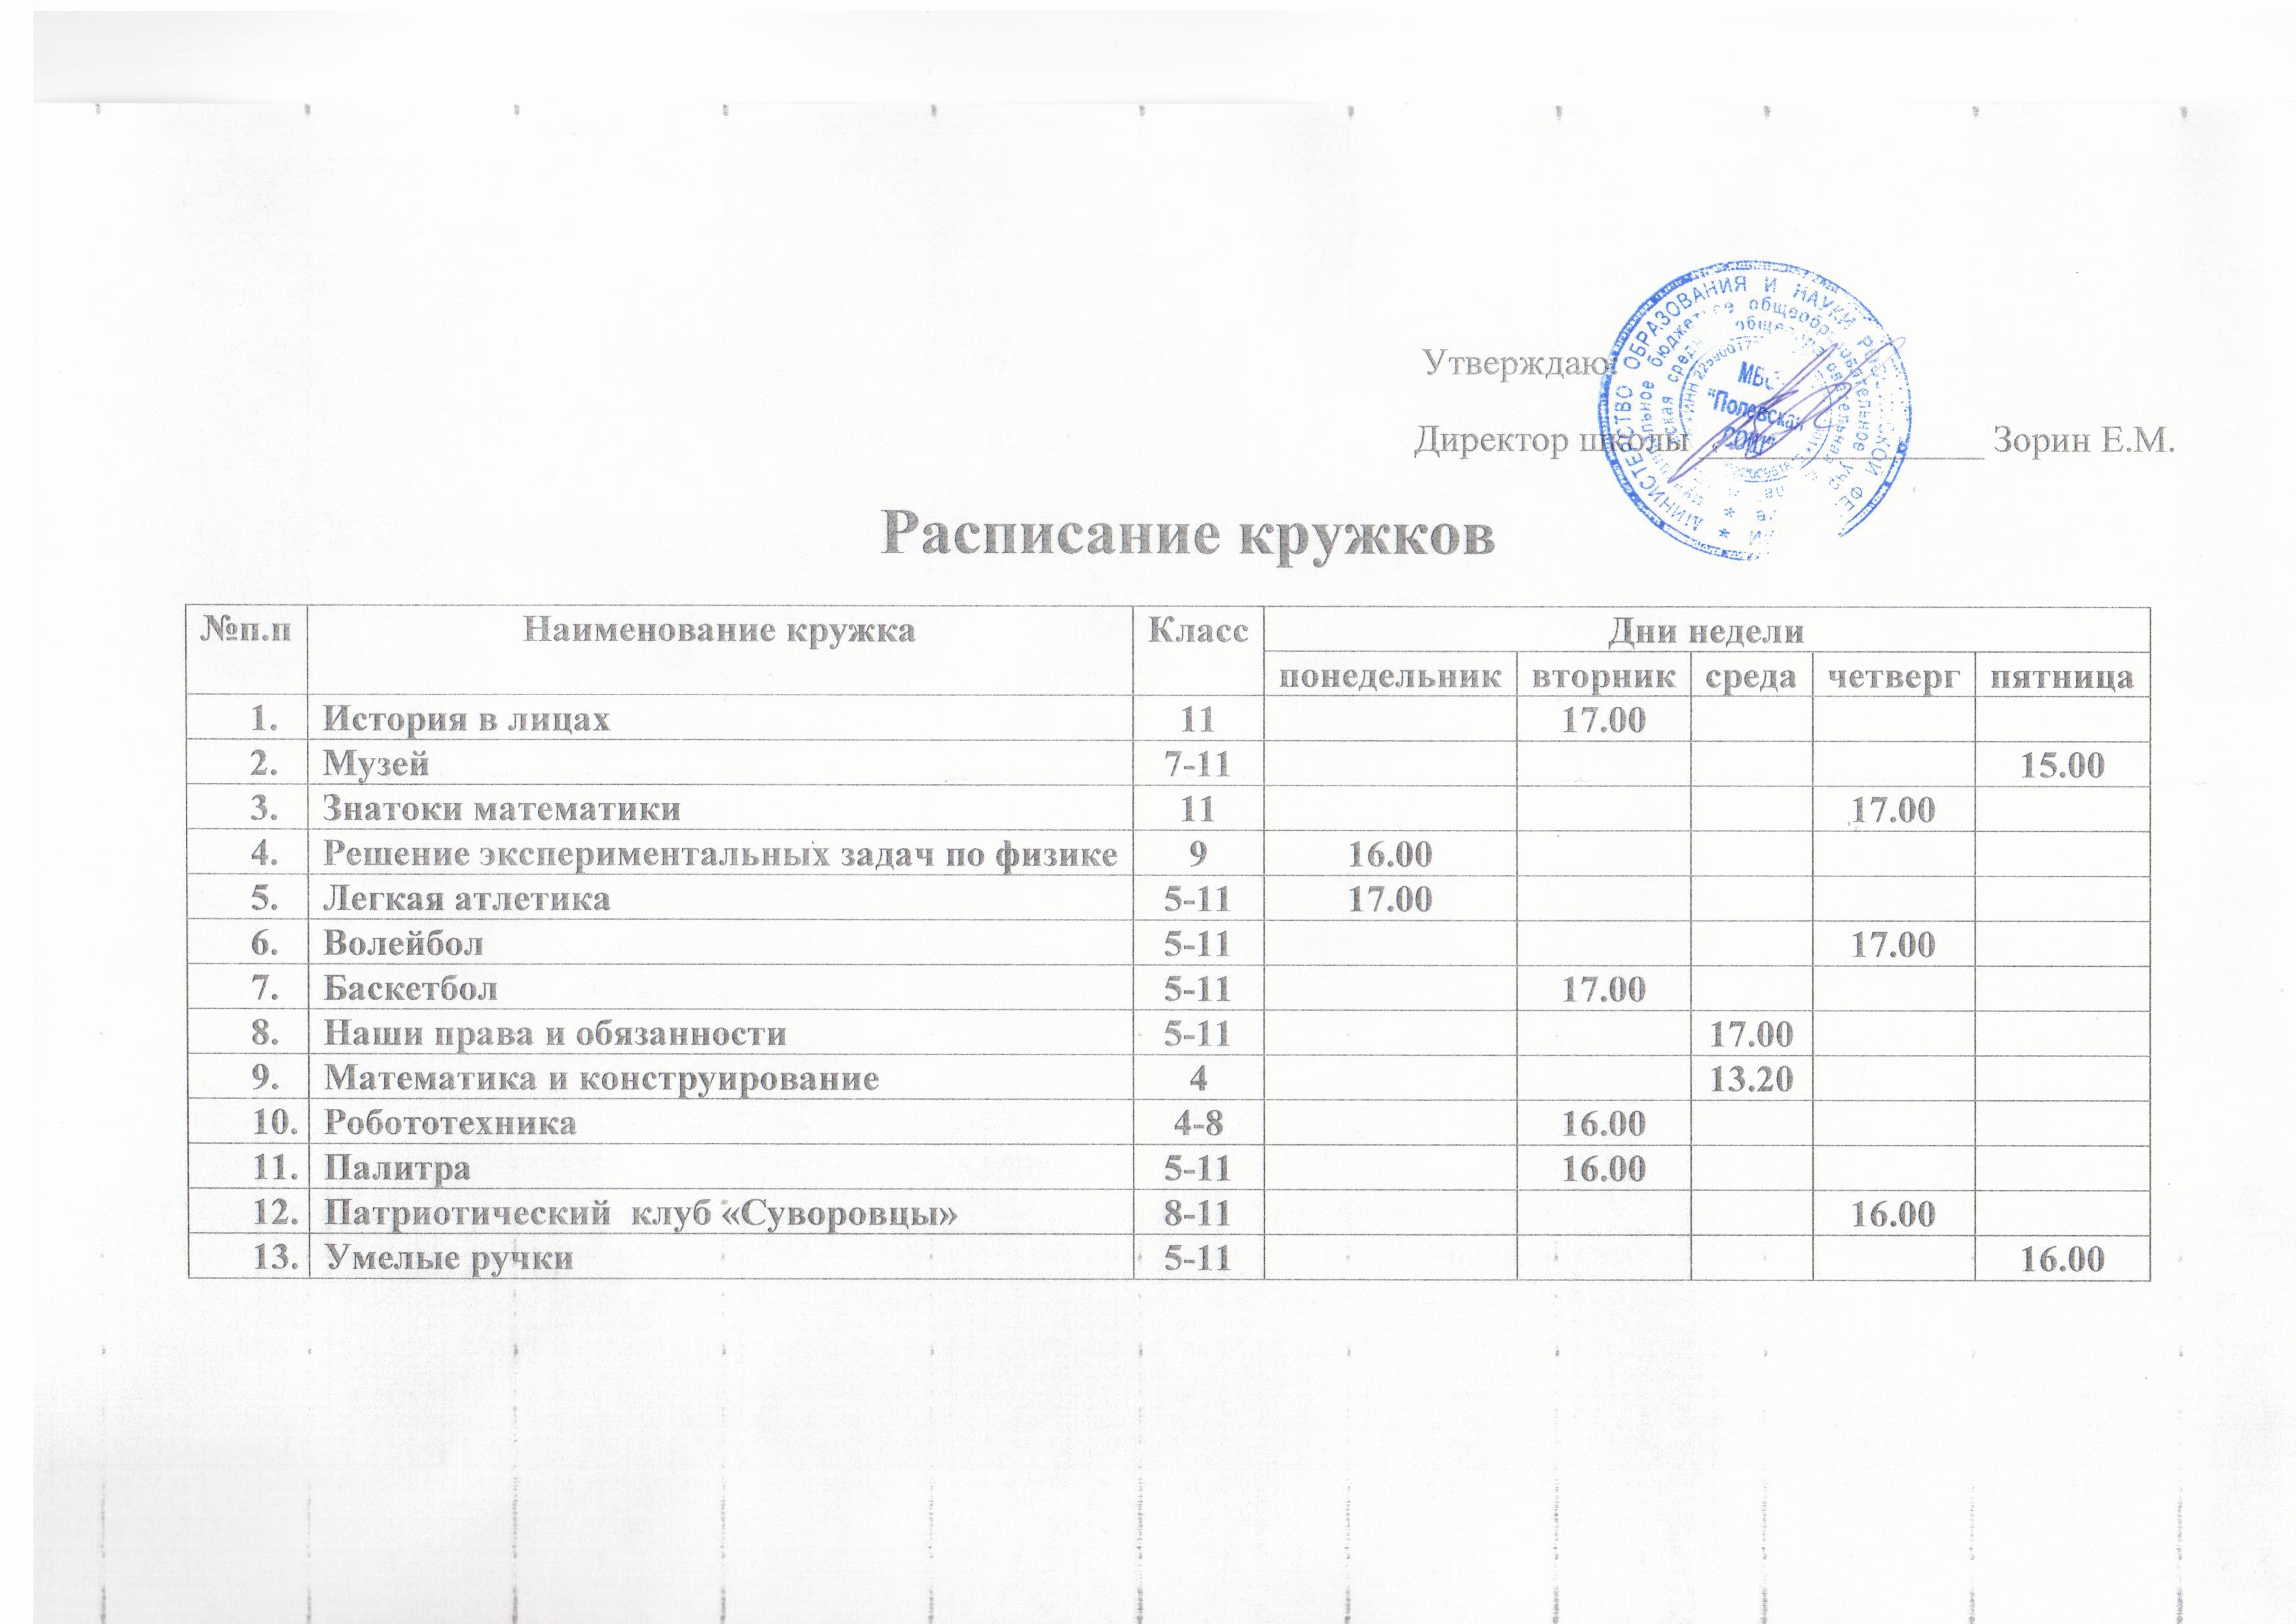 http://polscool.ucoz.ru/sekritariat/2017/30003.jpg